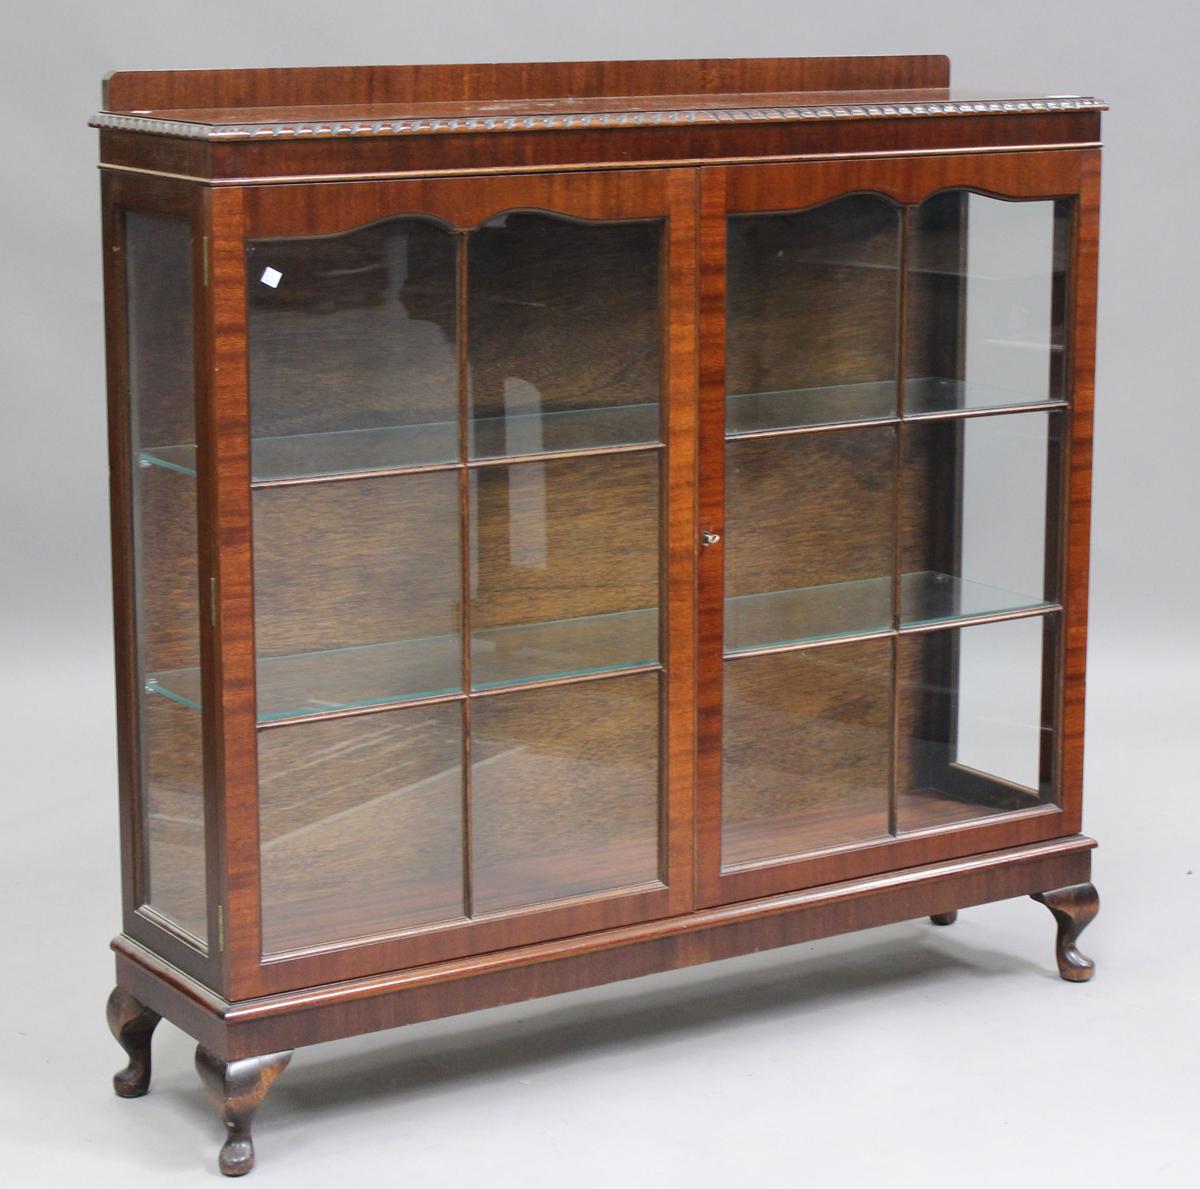 A George V mahogany display cabinet, on cabriole legs, height 120cm, width 123cm, depth 32cm.Buyer's